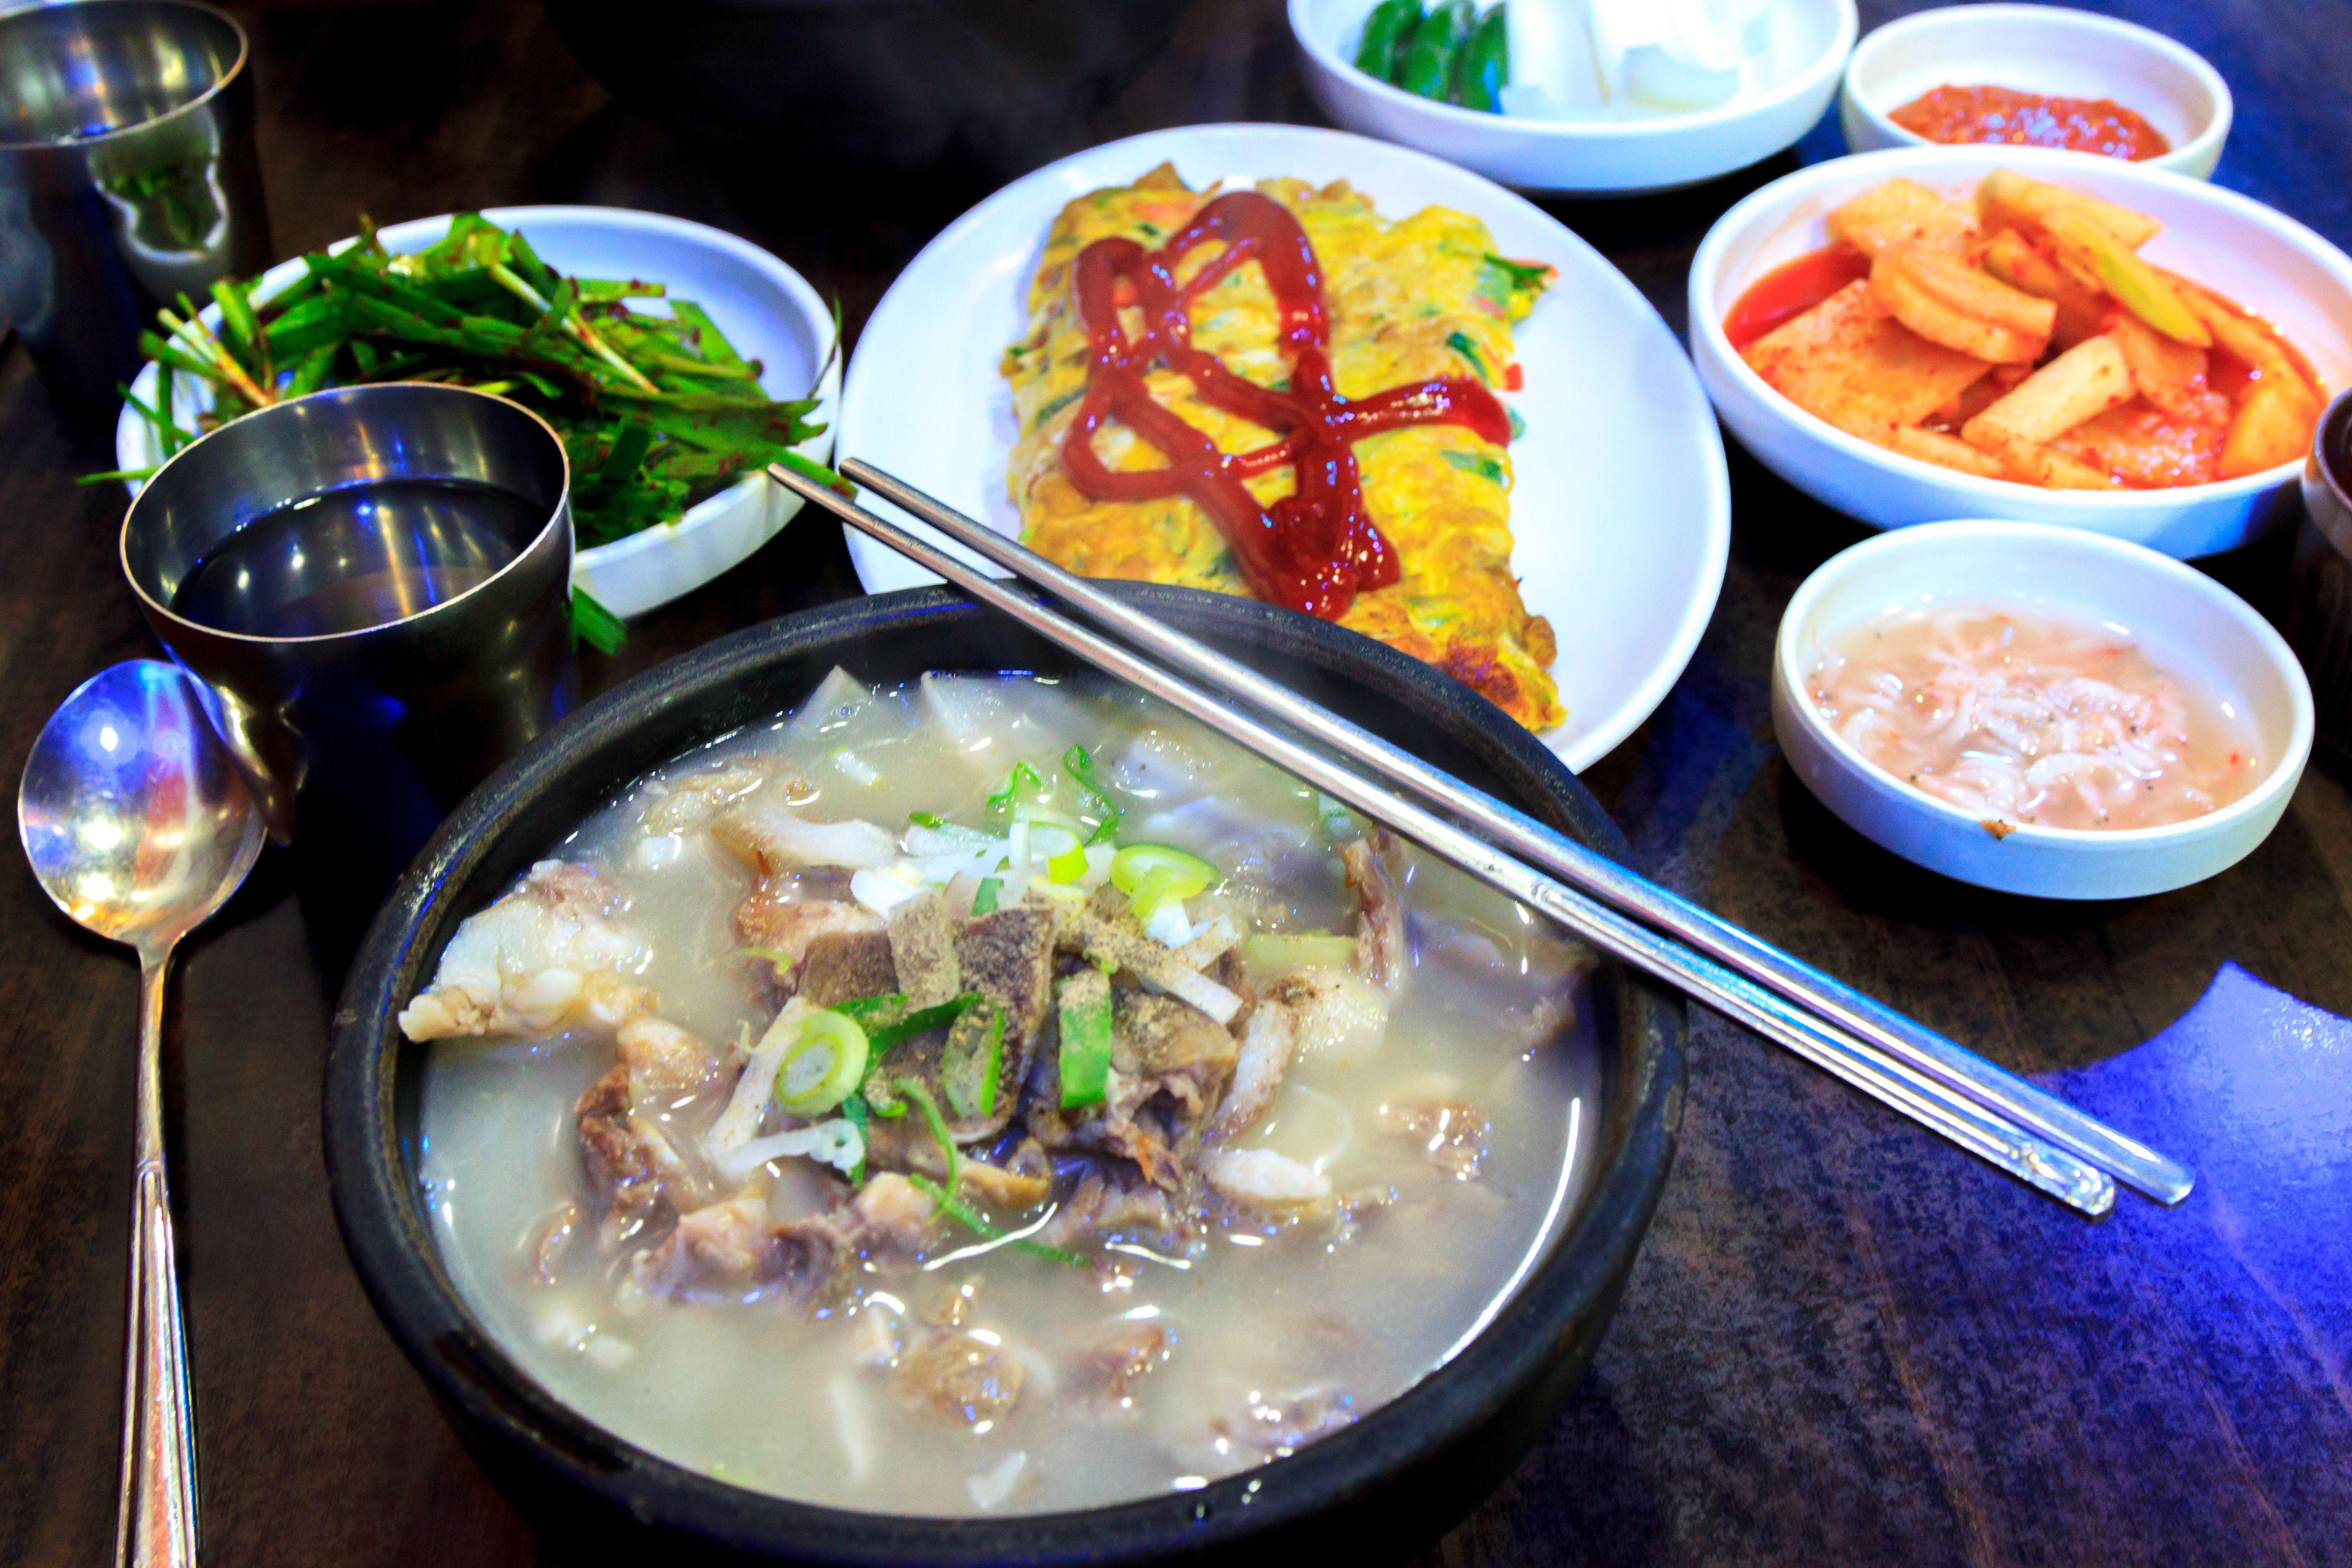 Korean spread